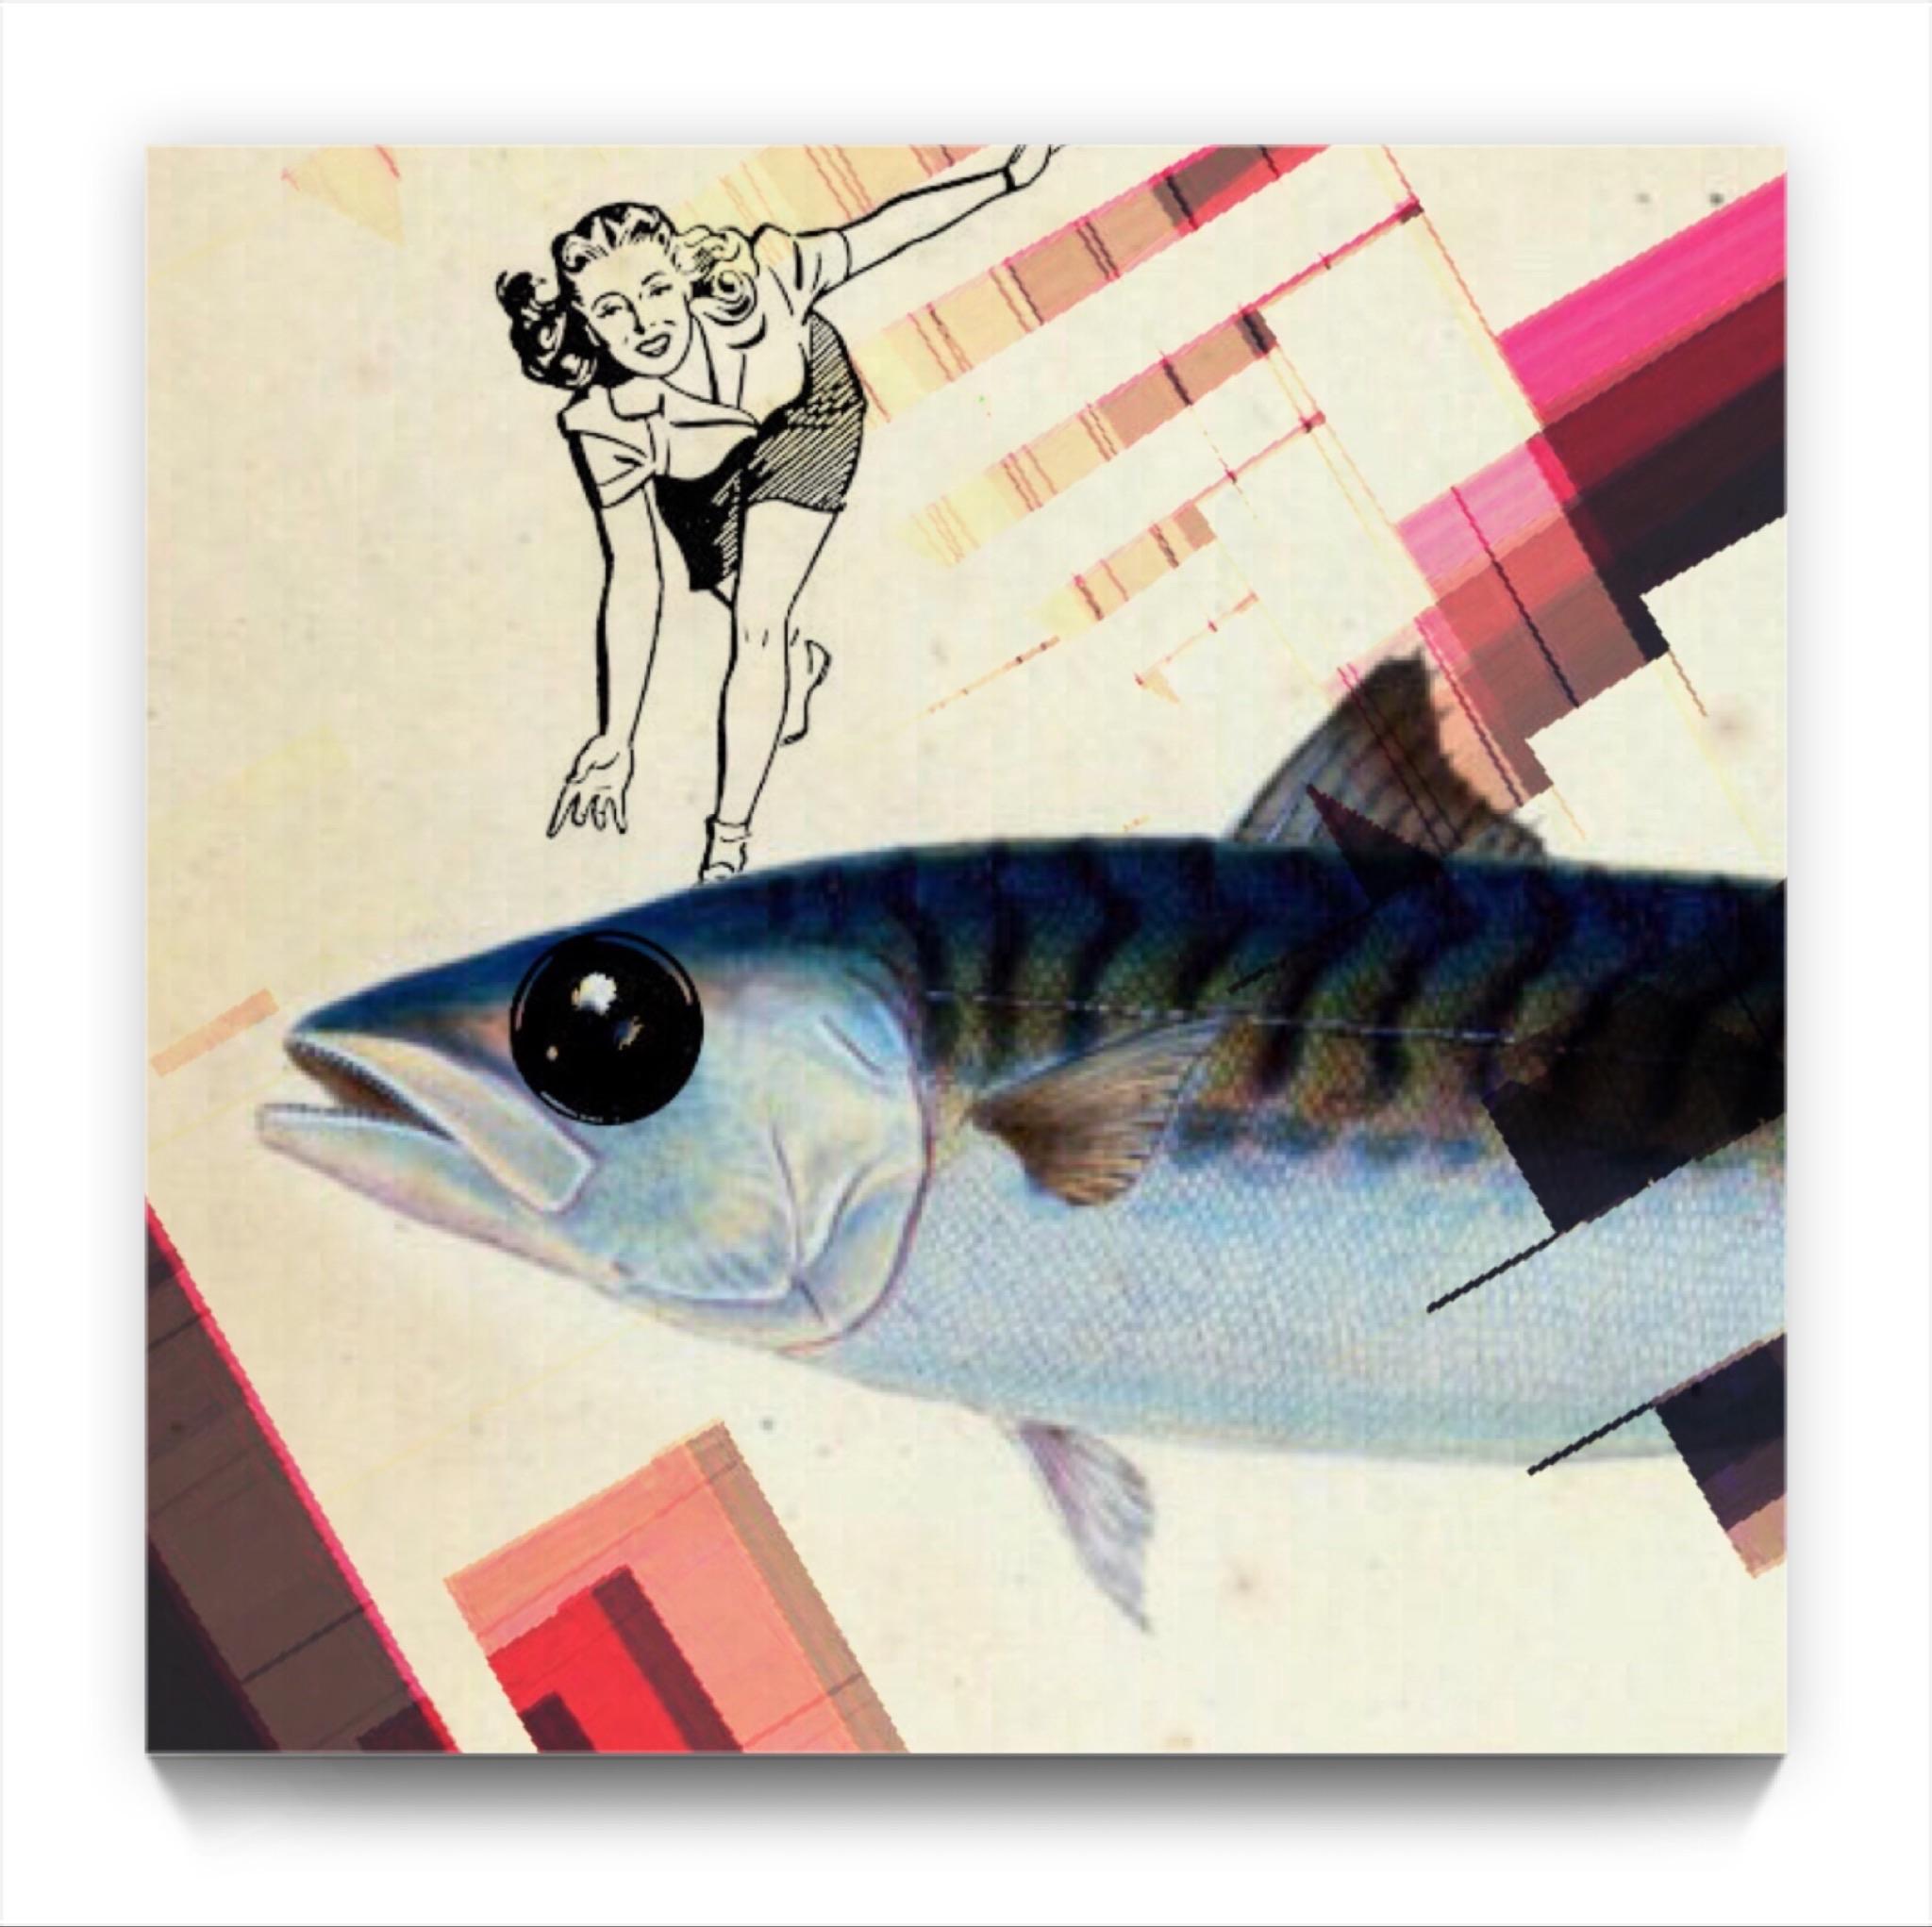 fishbowl by New Media iphone Artist Mark Sedgwick